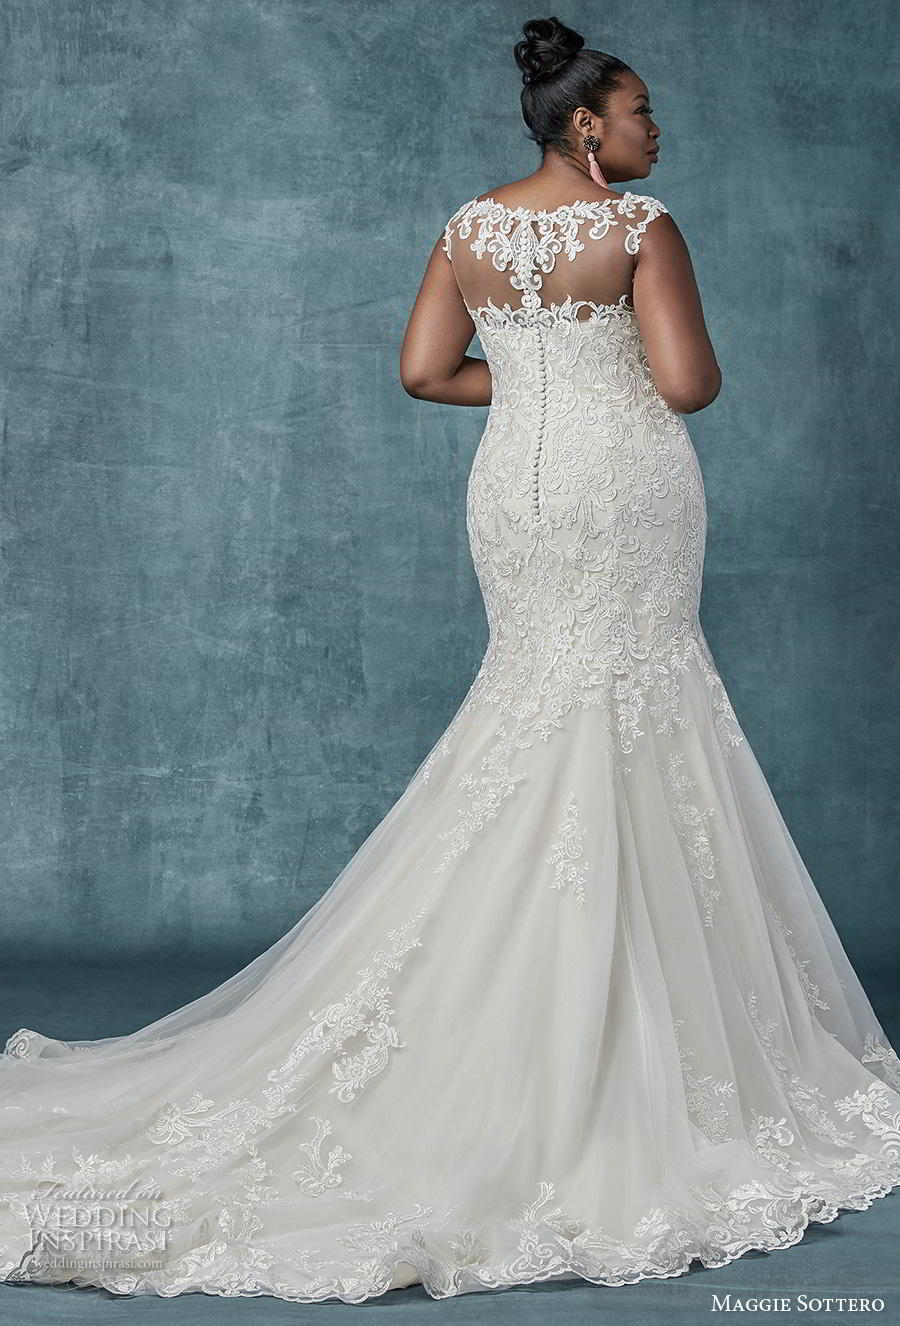 maggie sottero spring 2019 bridal sleeveless illusion bateau sweetheart neckline heavily embellished bodice elegant mermaid wedding dress sheer lace back chapel train (13) bv